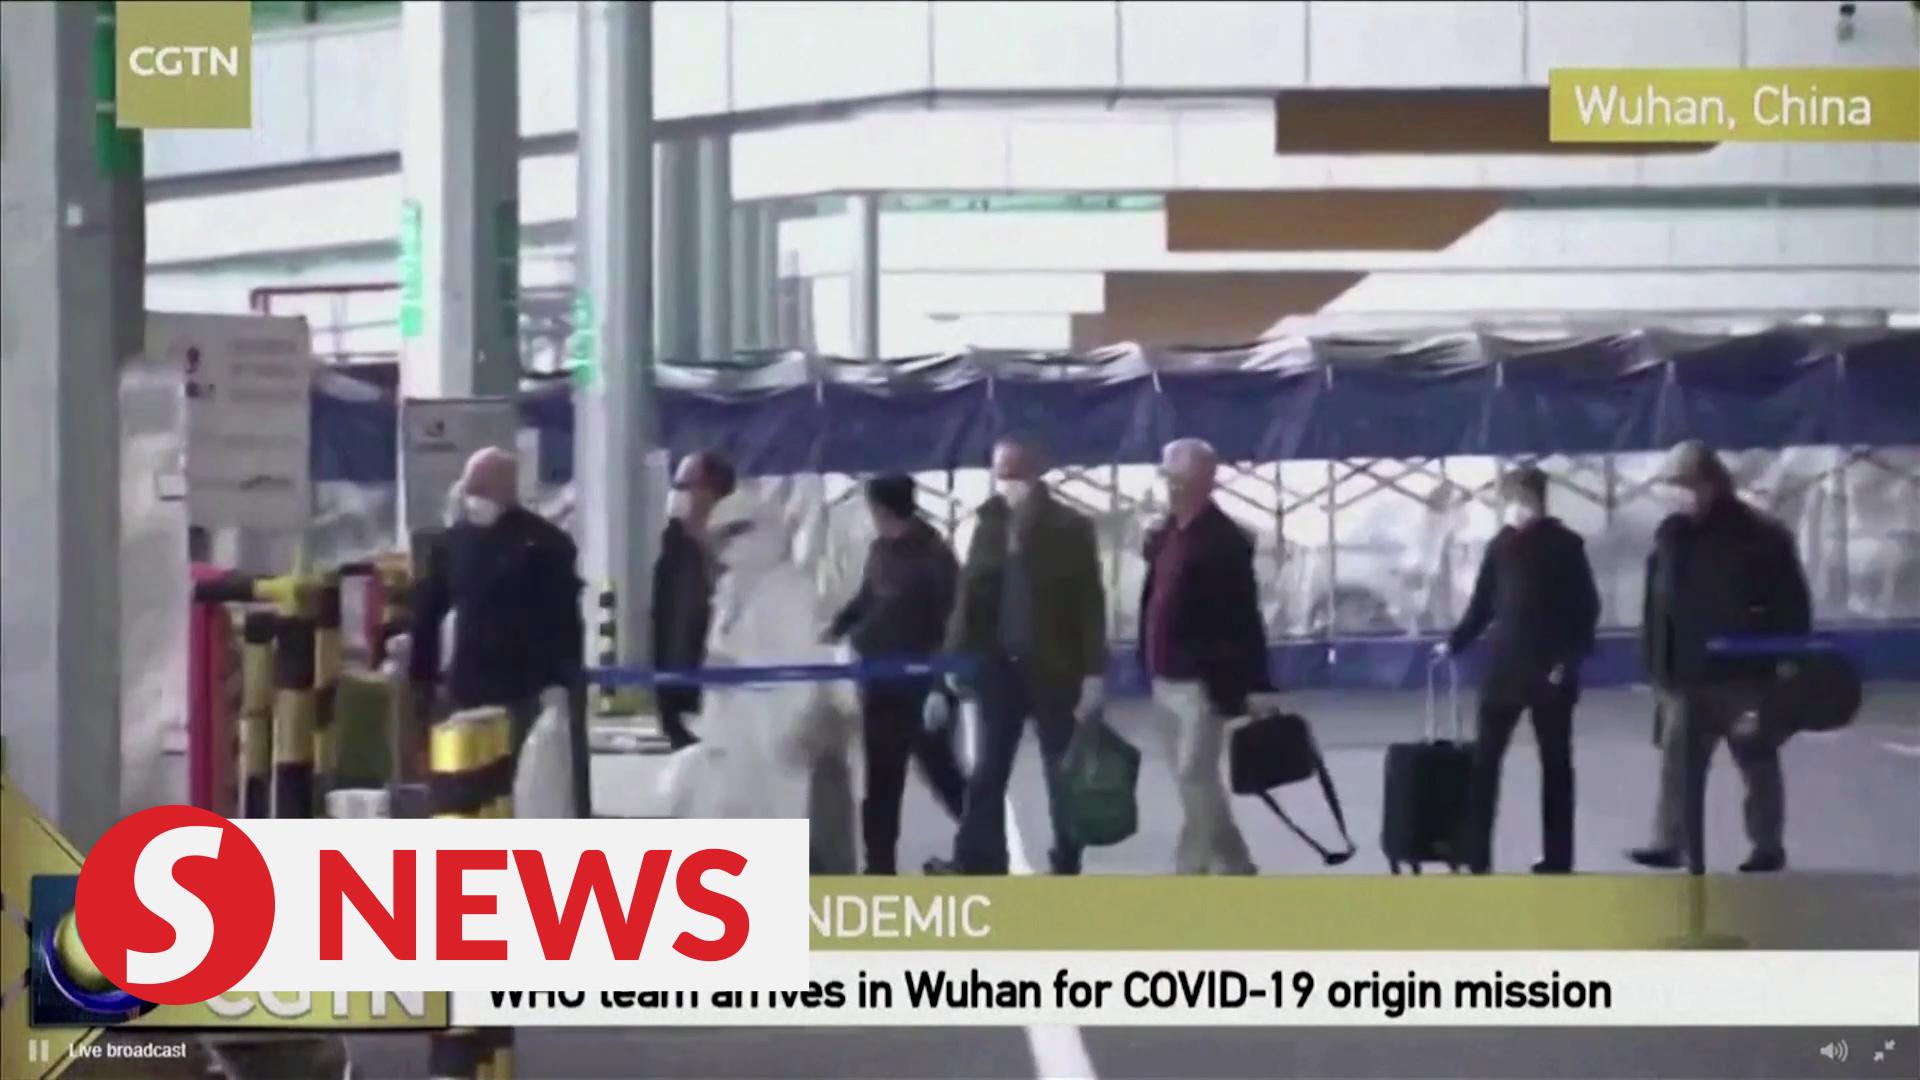 WHO coronavirus investigators arrive in Wuhan